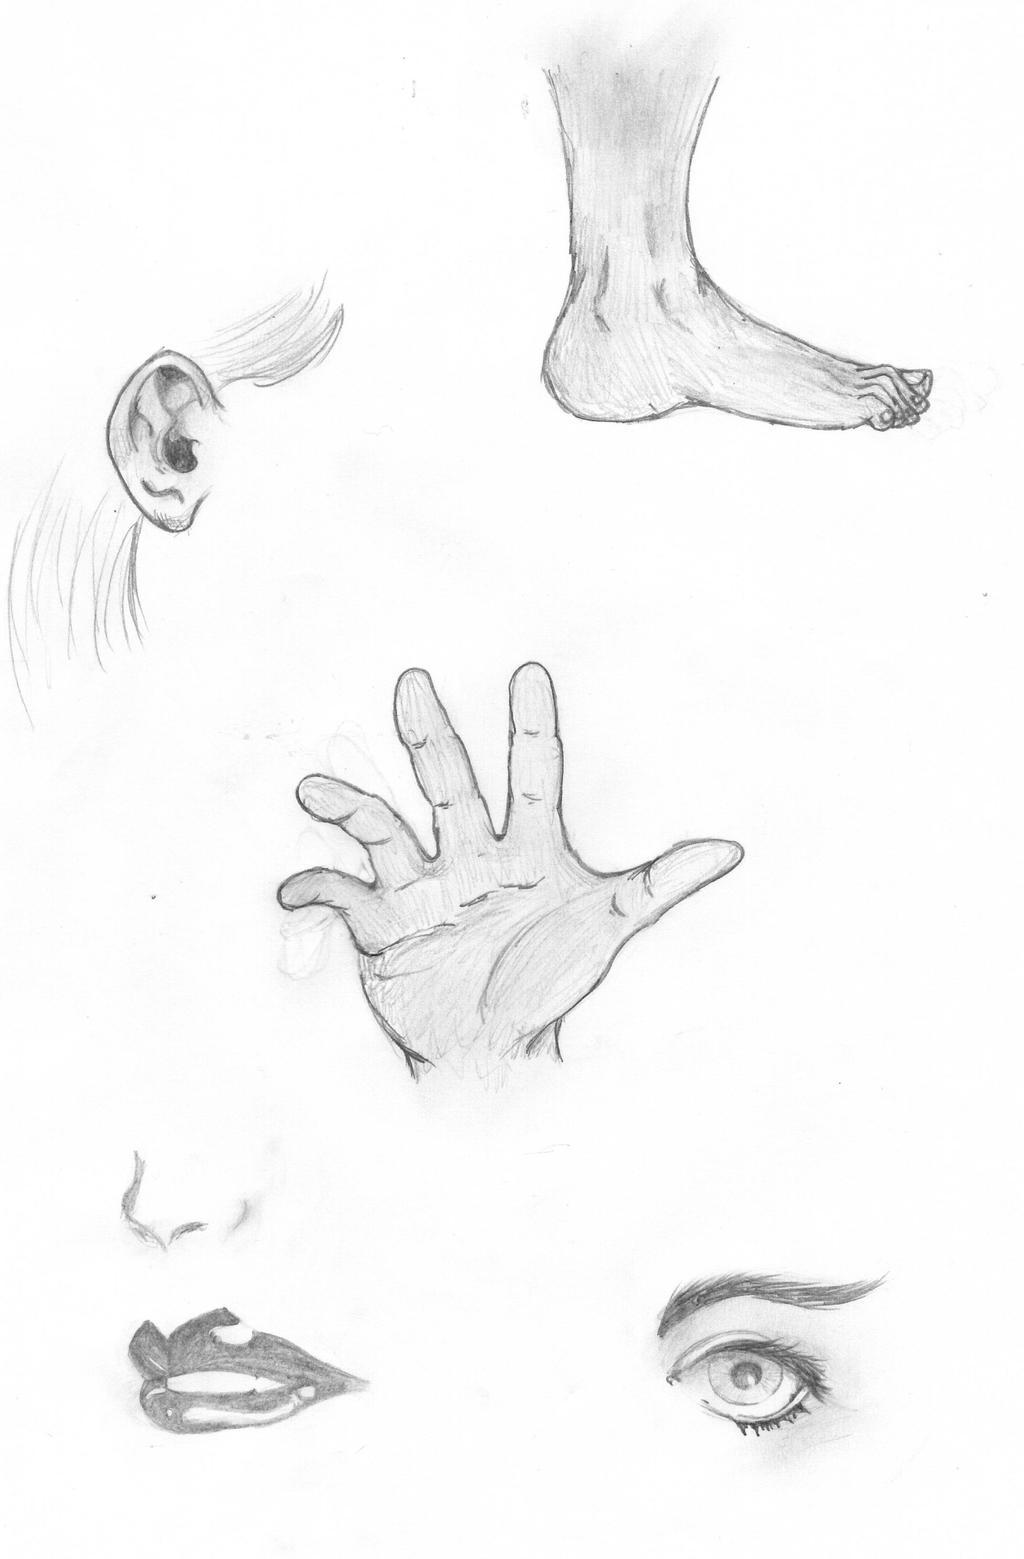 Sketching Body Parts By Freakysart On Deviantart